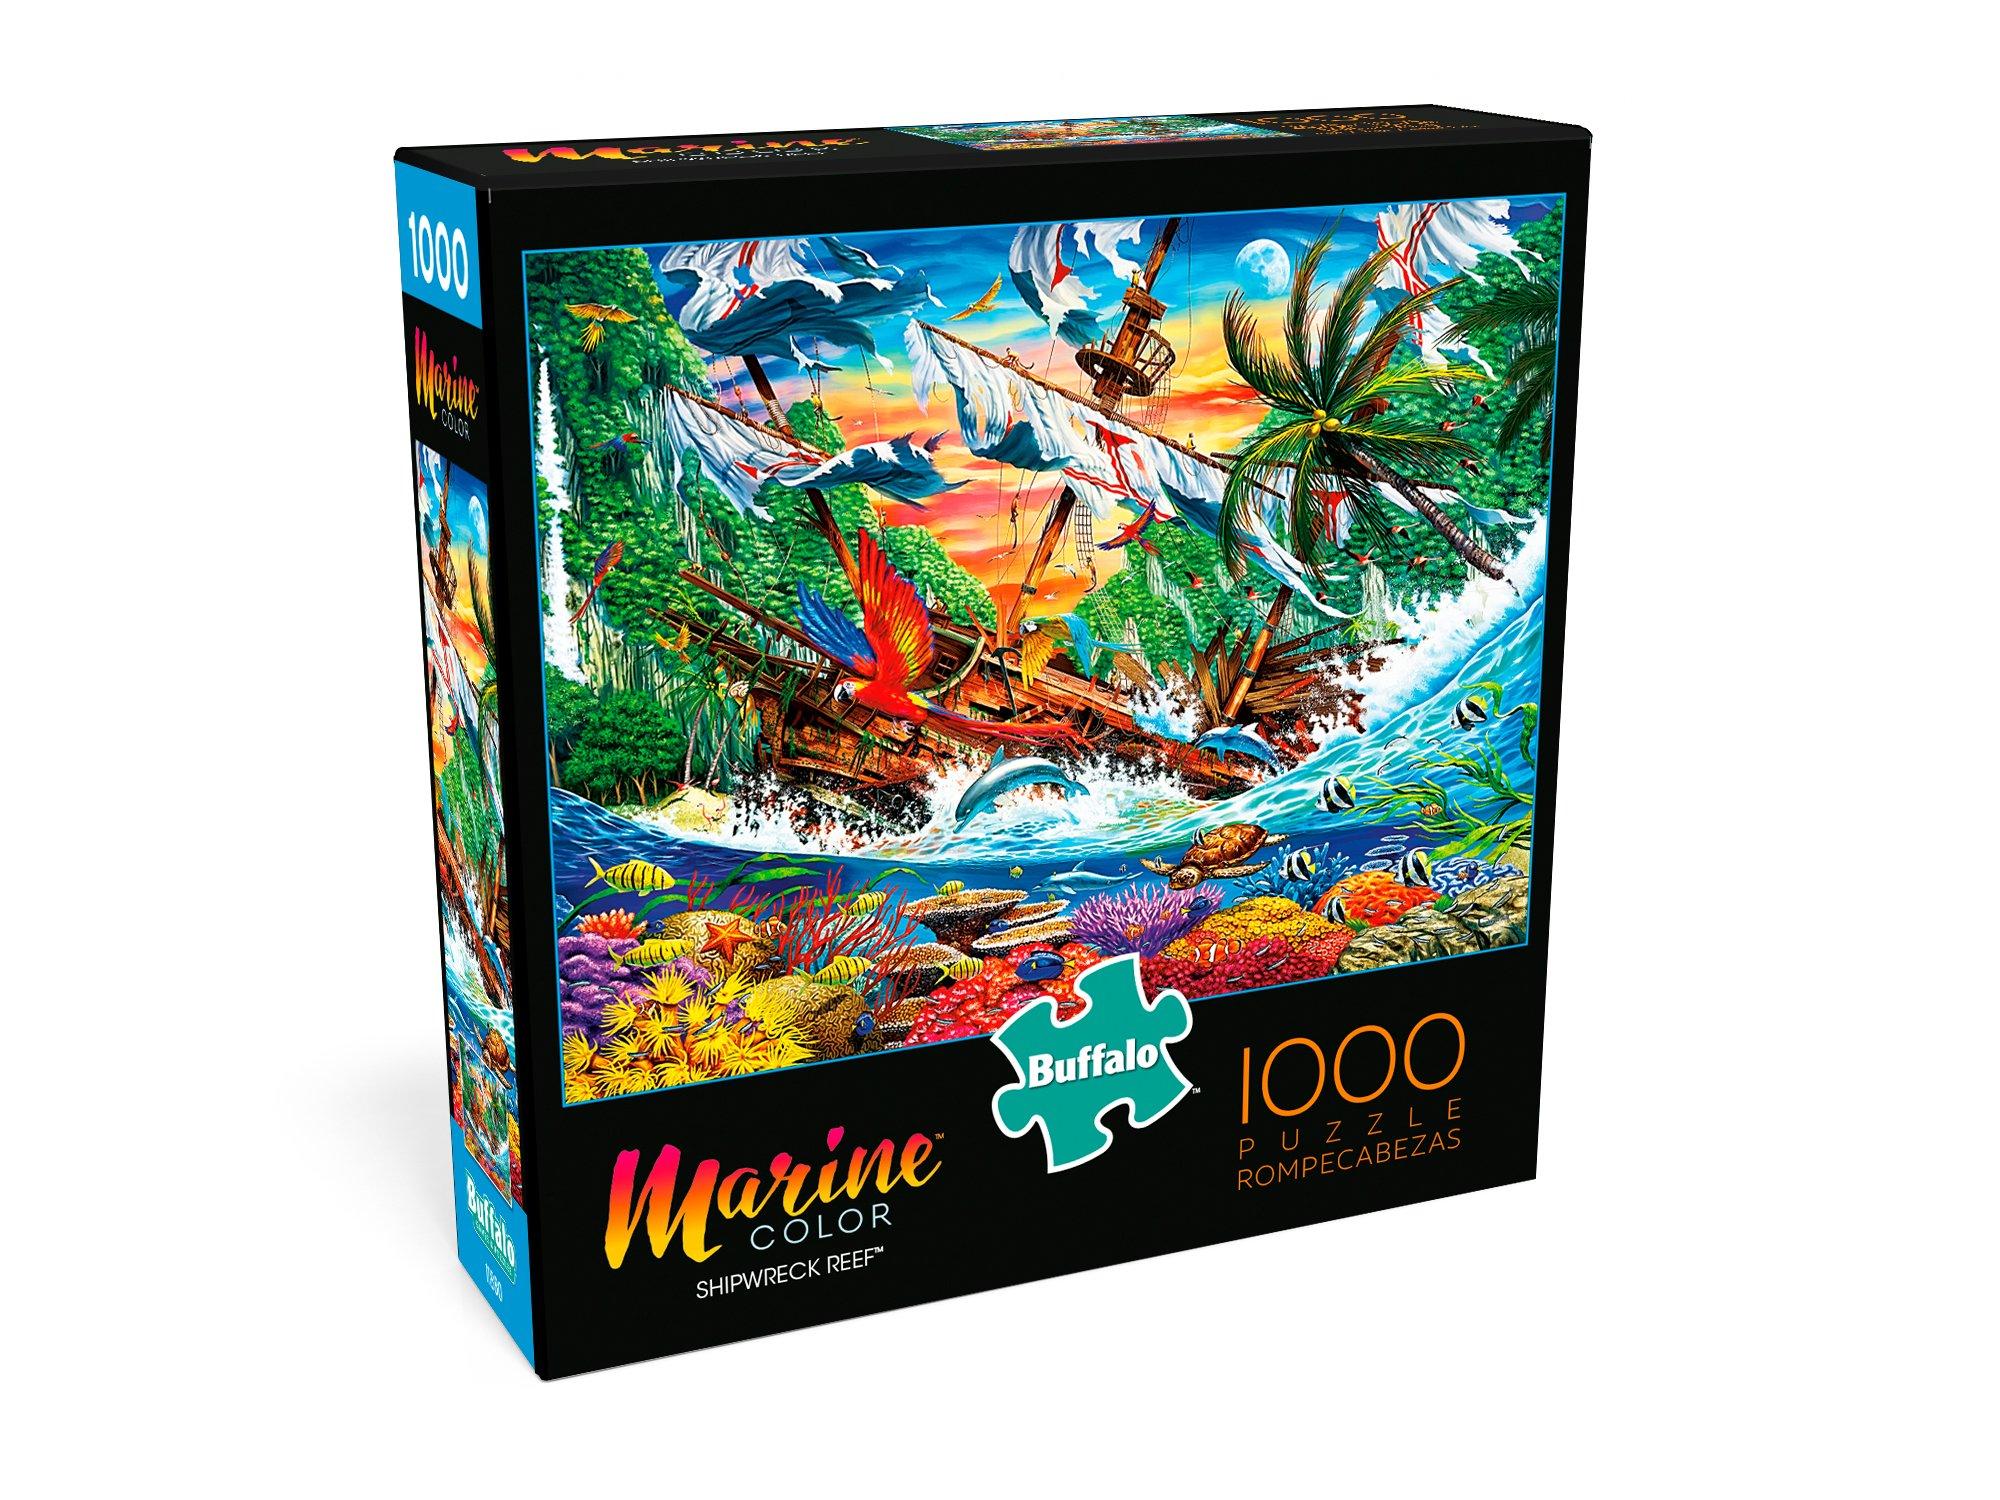 Buffalo Games - Marine Color - Shipwreck Reef - 1000 Piece Jigsaw Puzzle by Buffalo Games (Image #3)